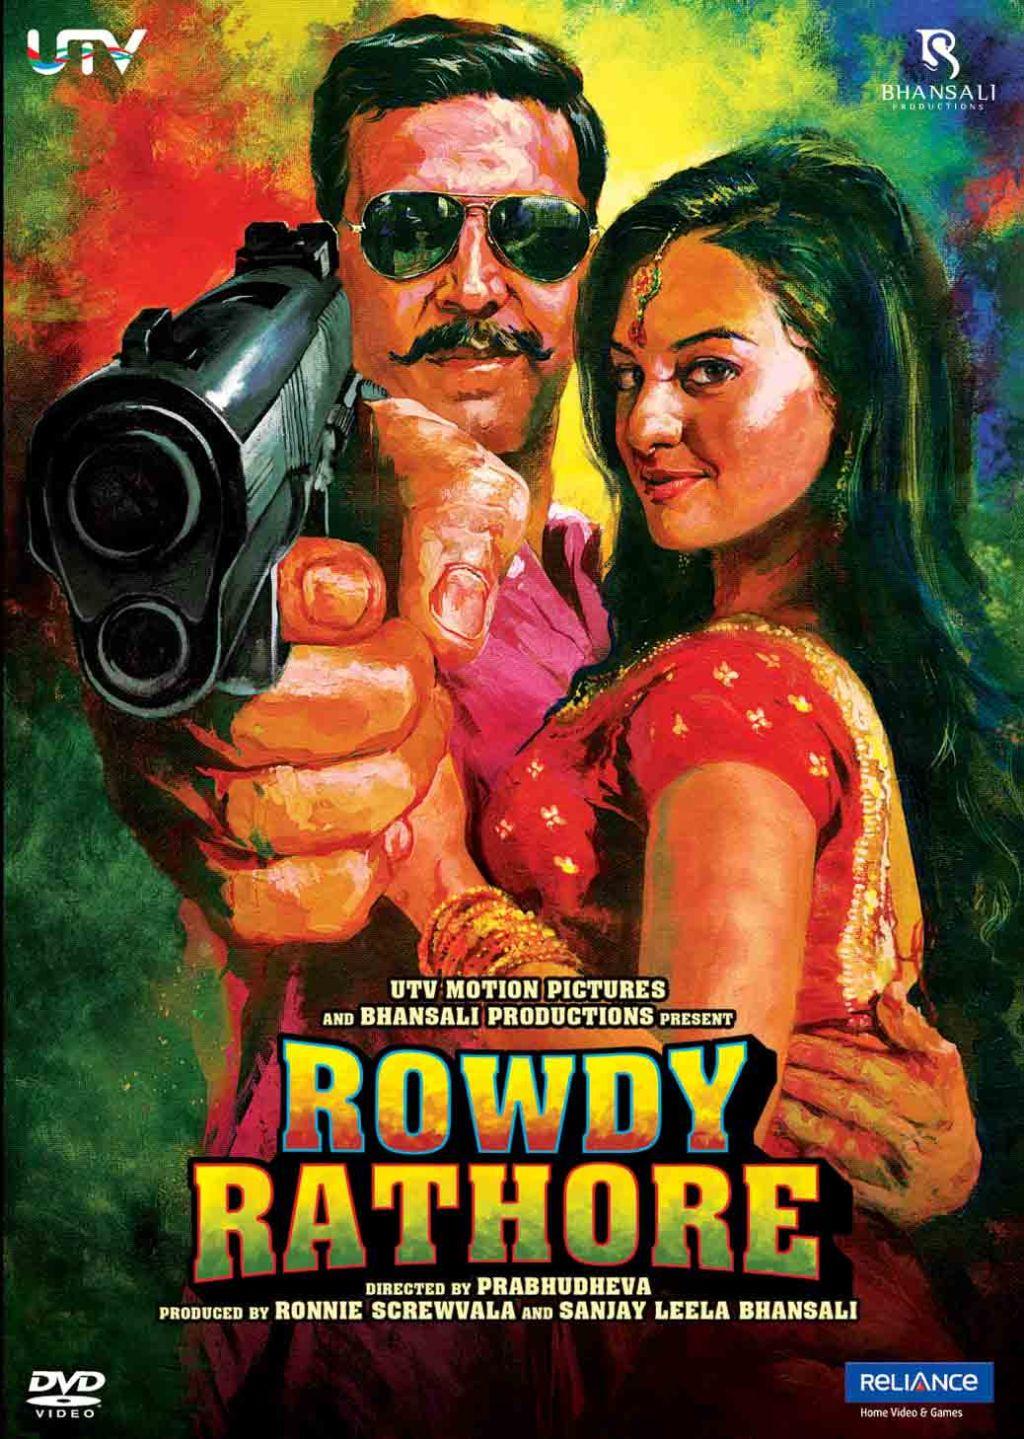 Rowdy Rathore Movie Poster HD Akshay Kumar